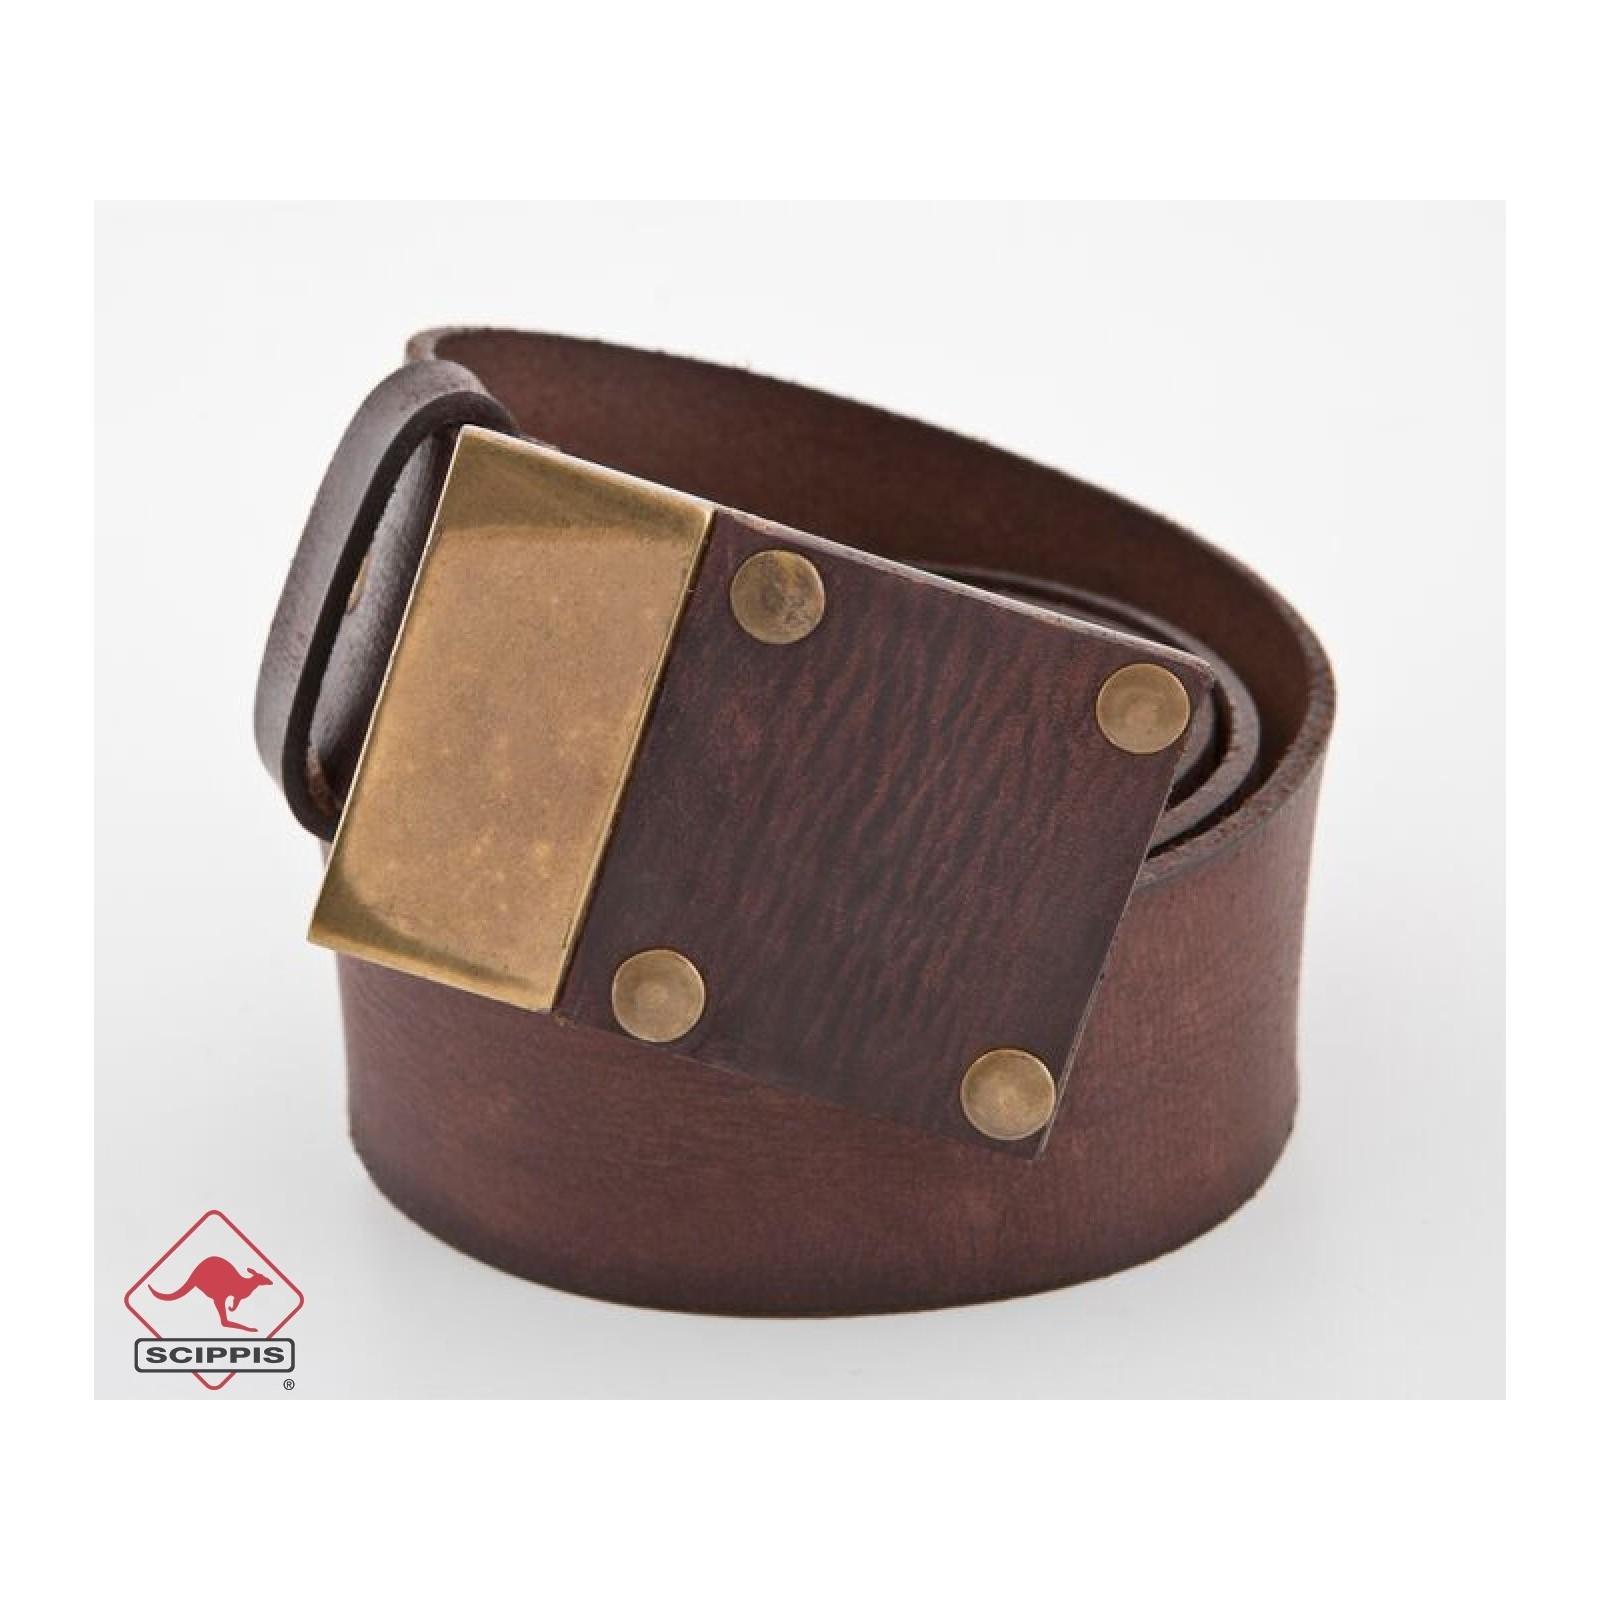 Scippis Douglas Leather Belt